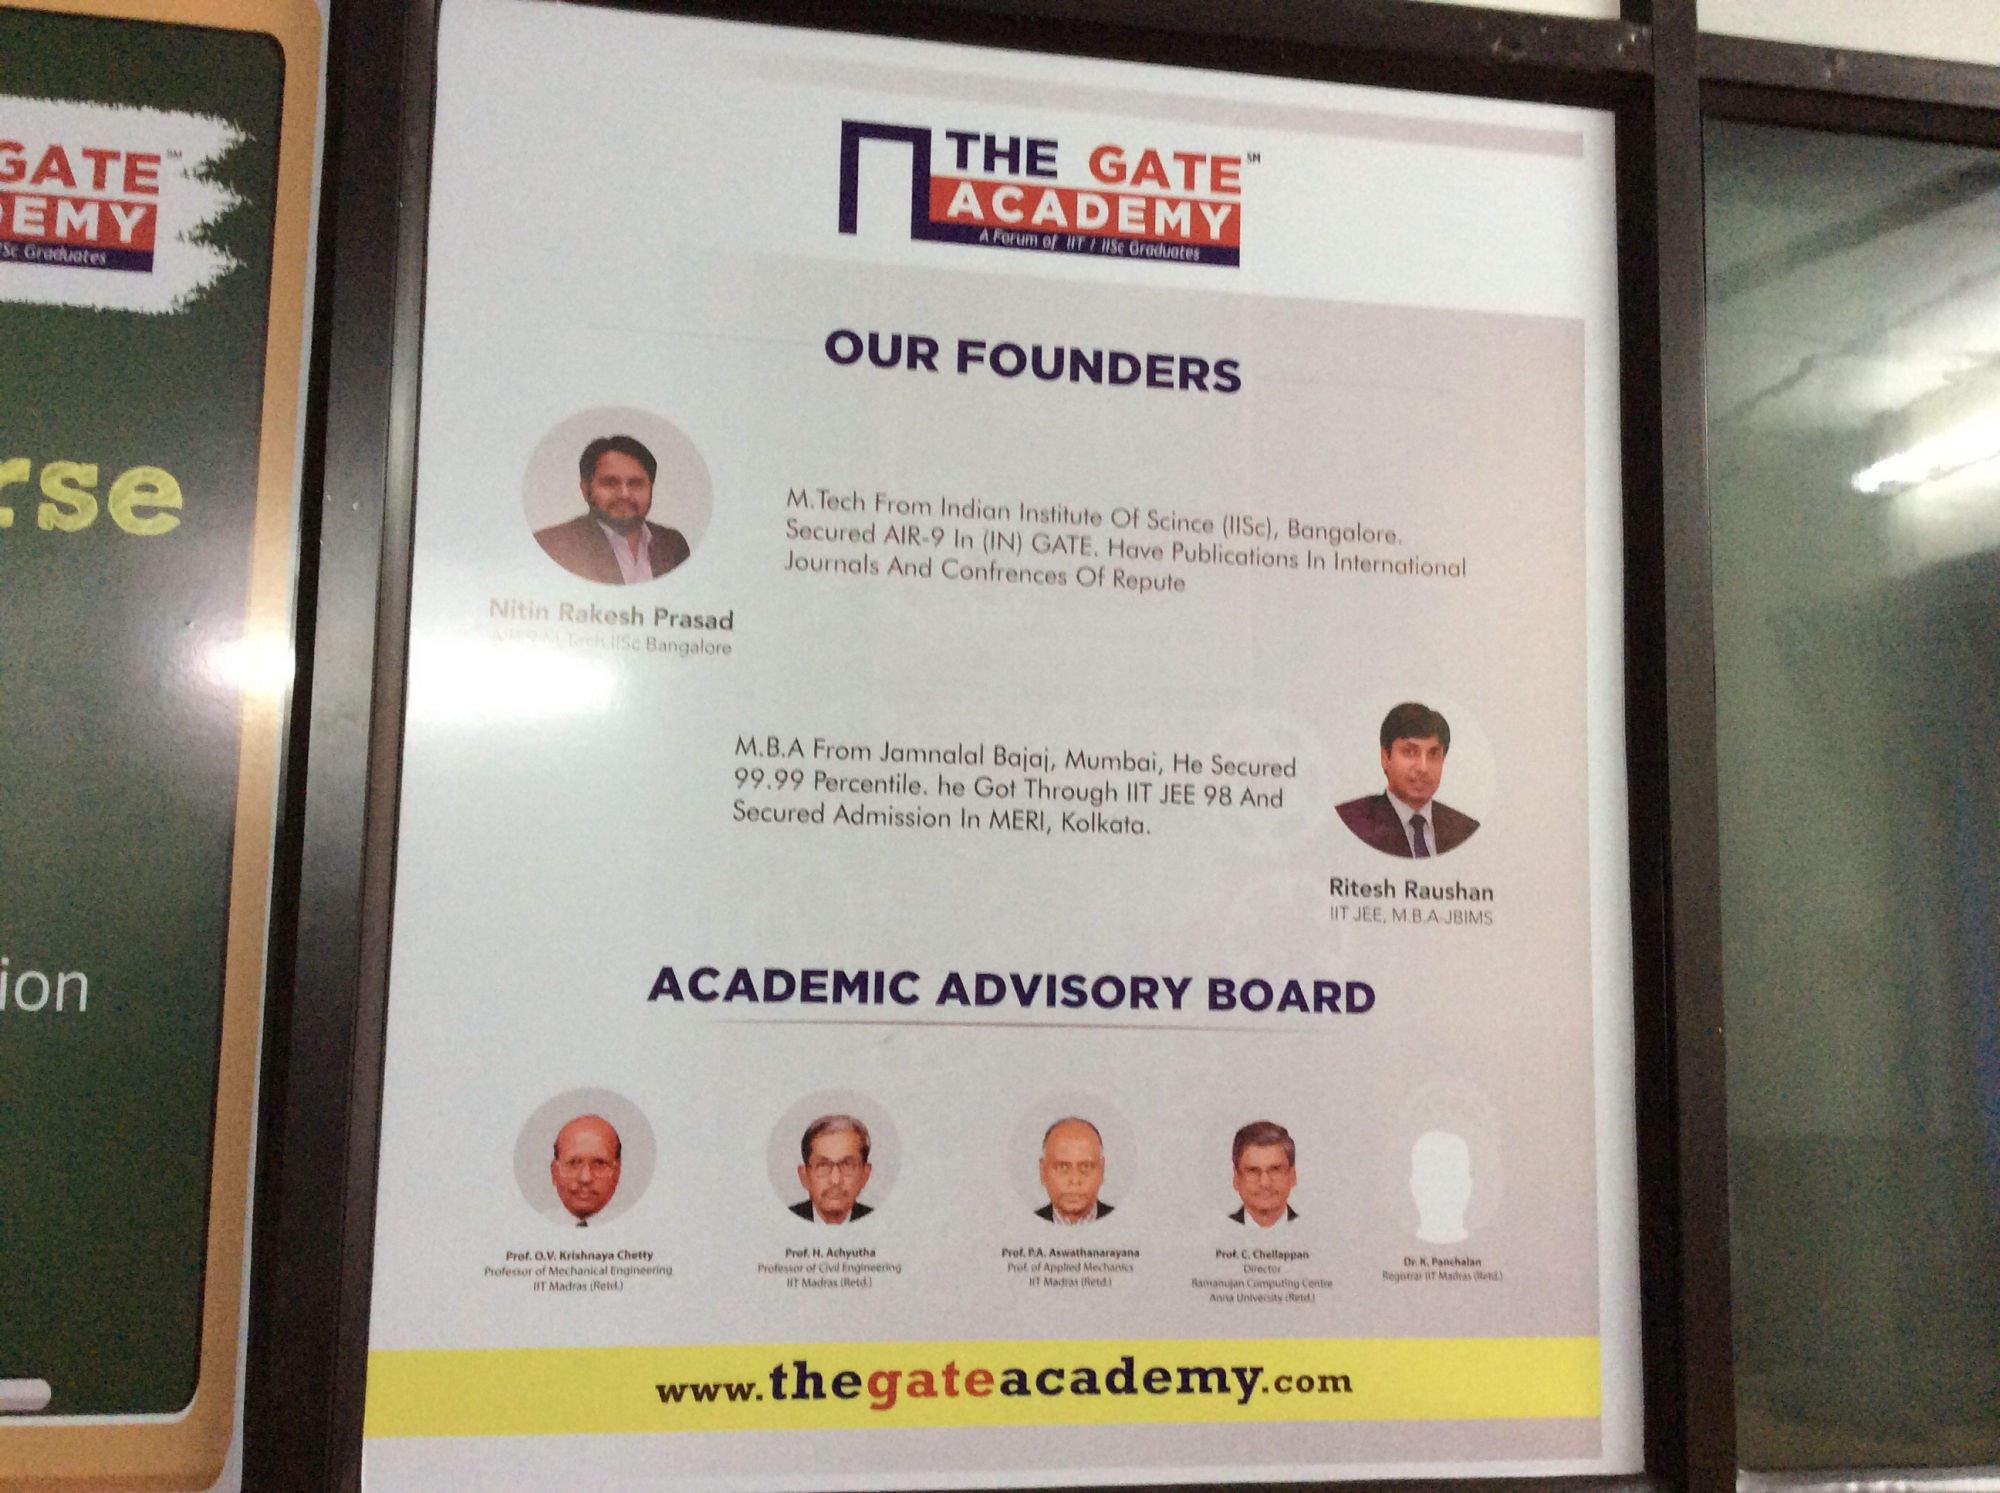 The Gate Academy